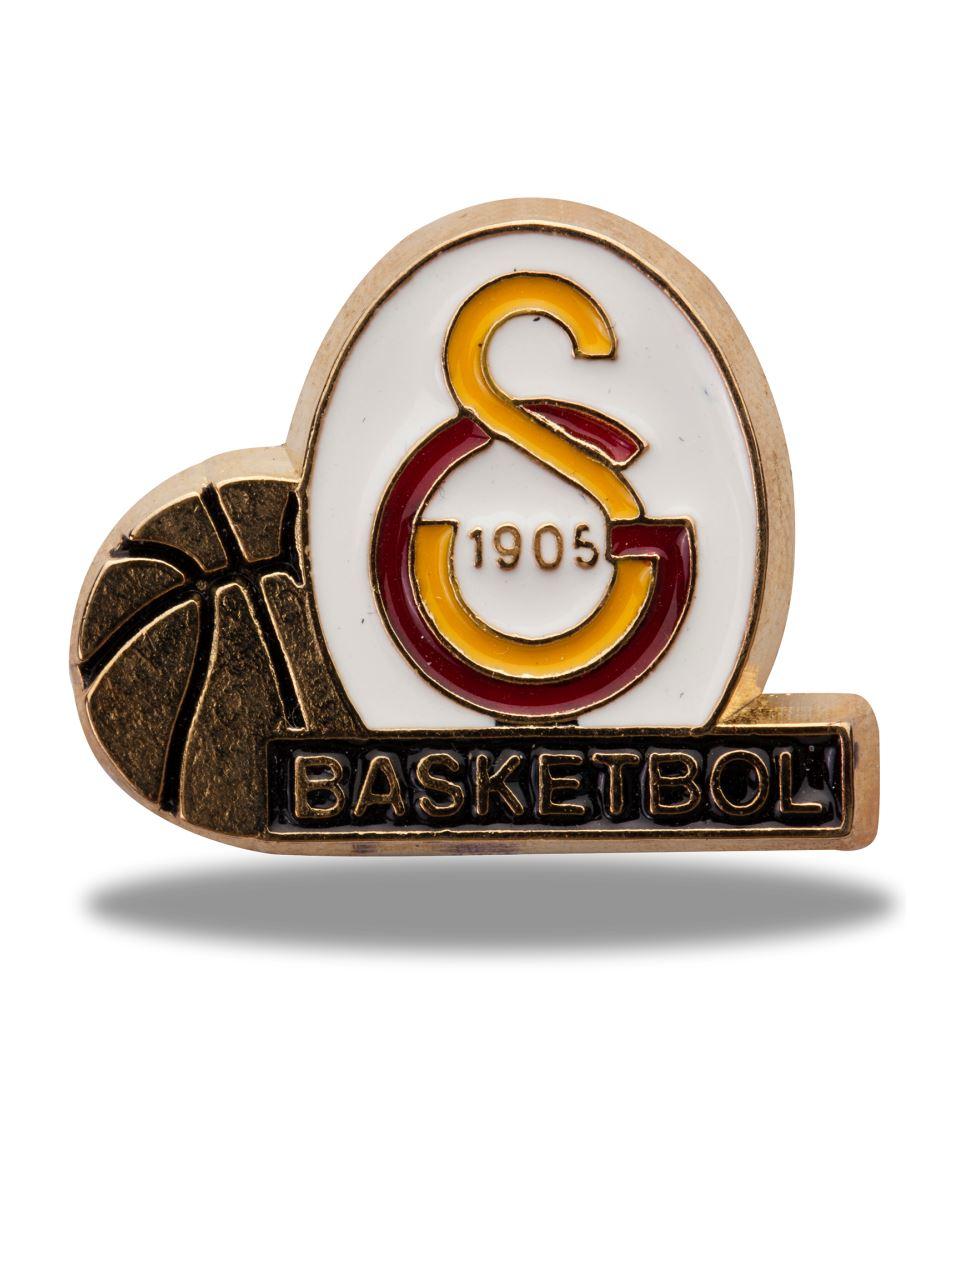 U75358 Basketbol Rozet